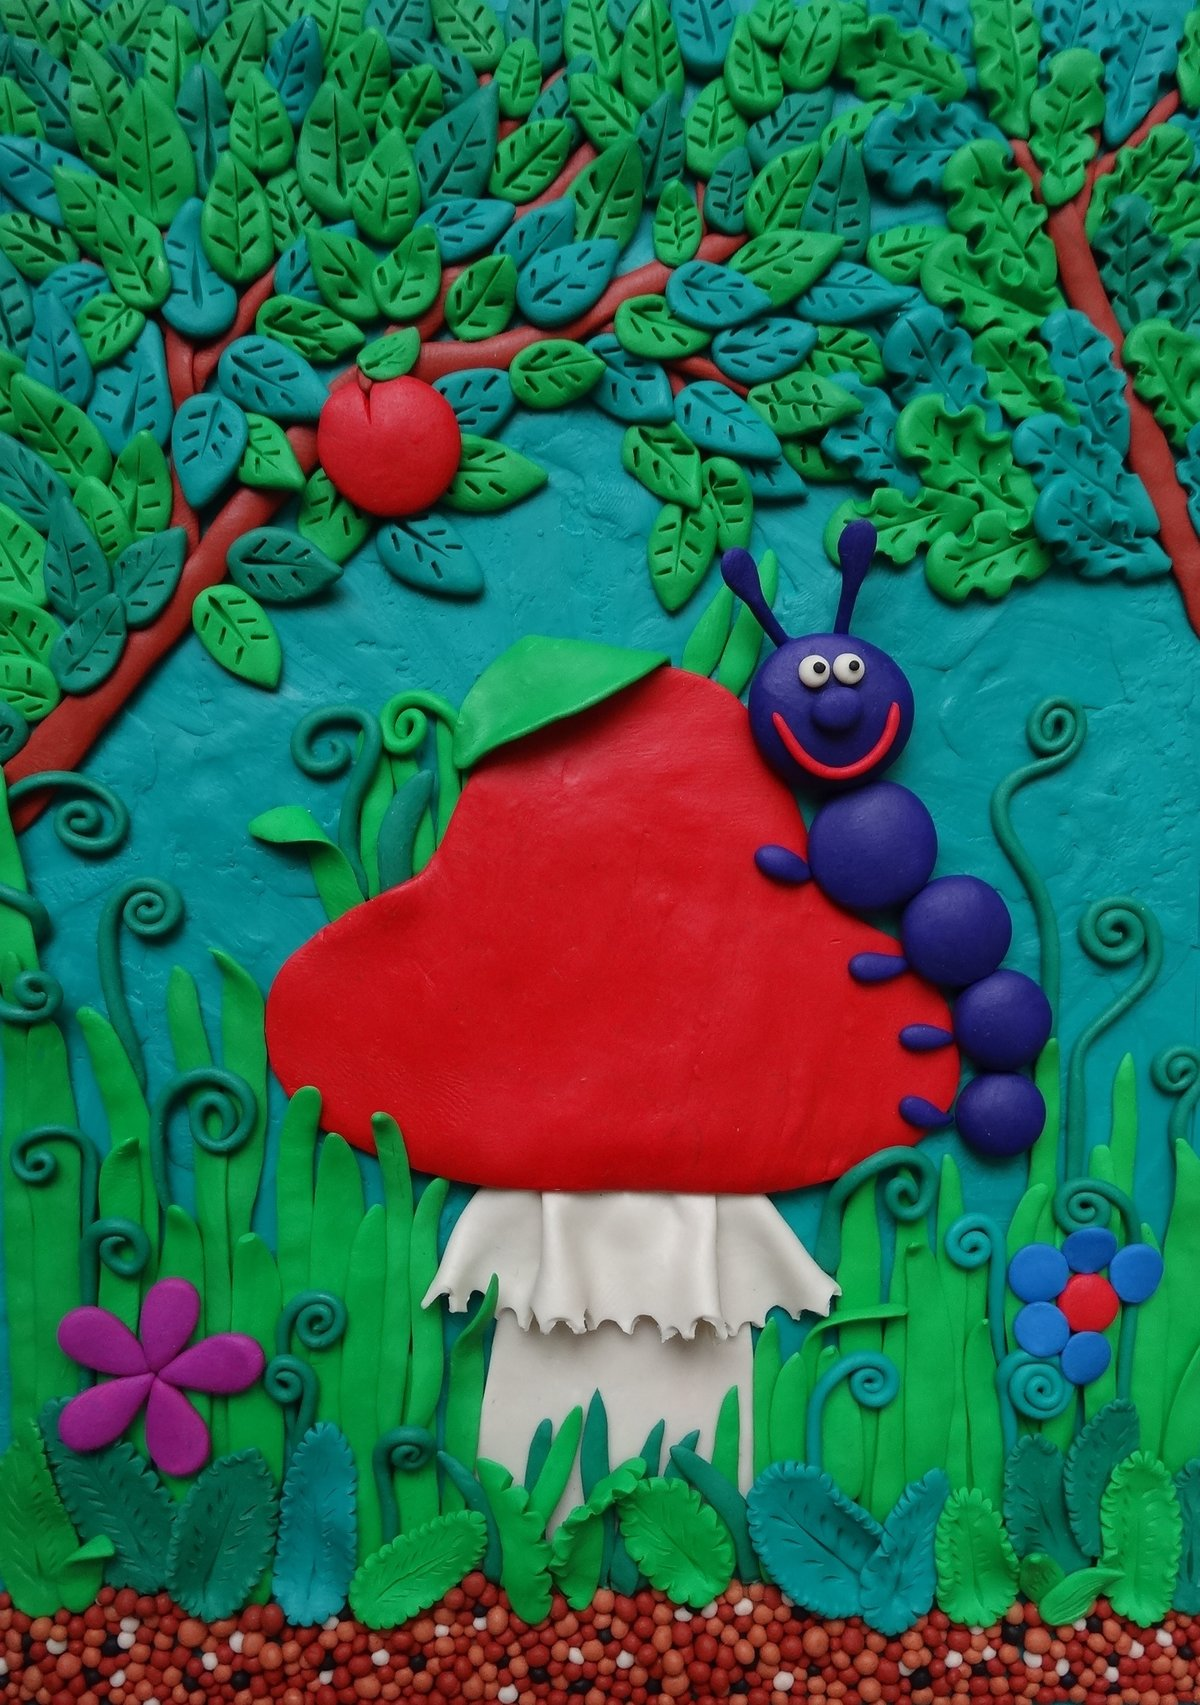 Пластилиновая живопись. идеи для творчества :: syl.ru